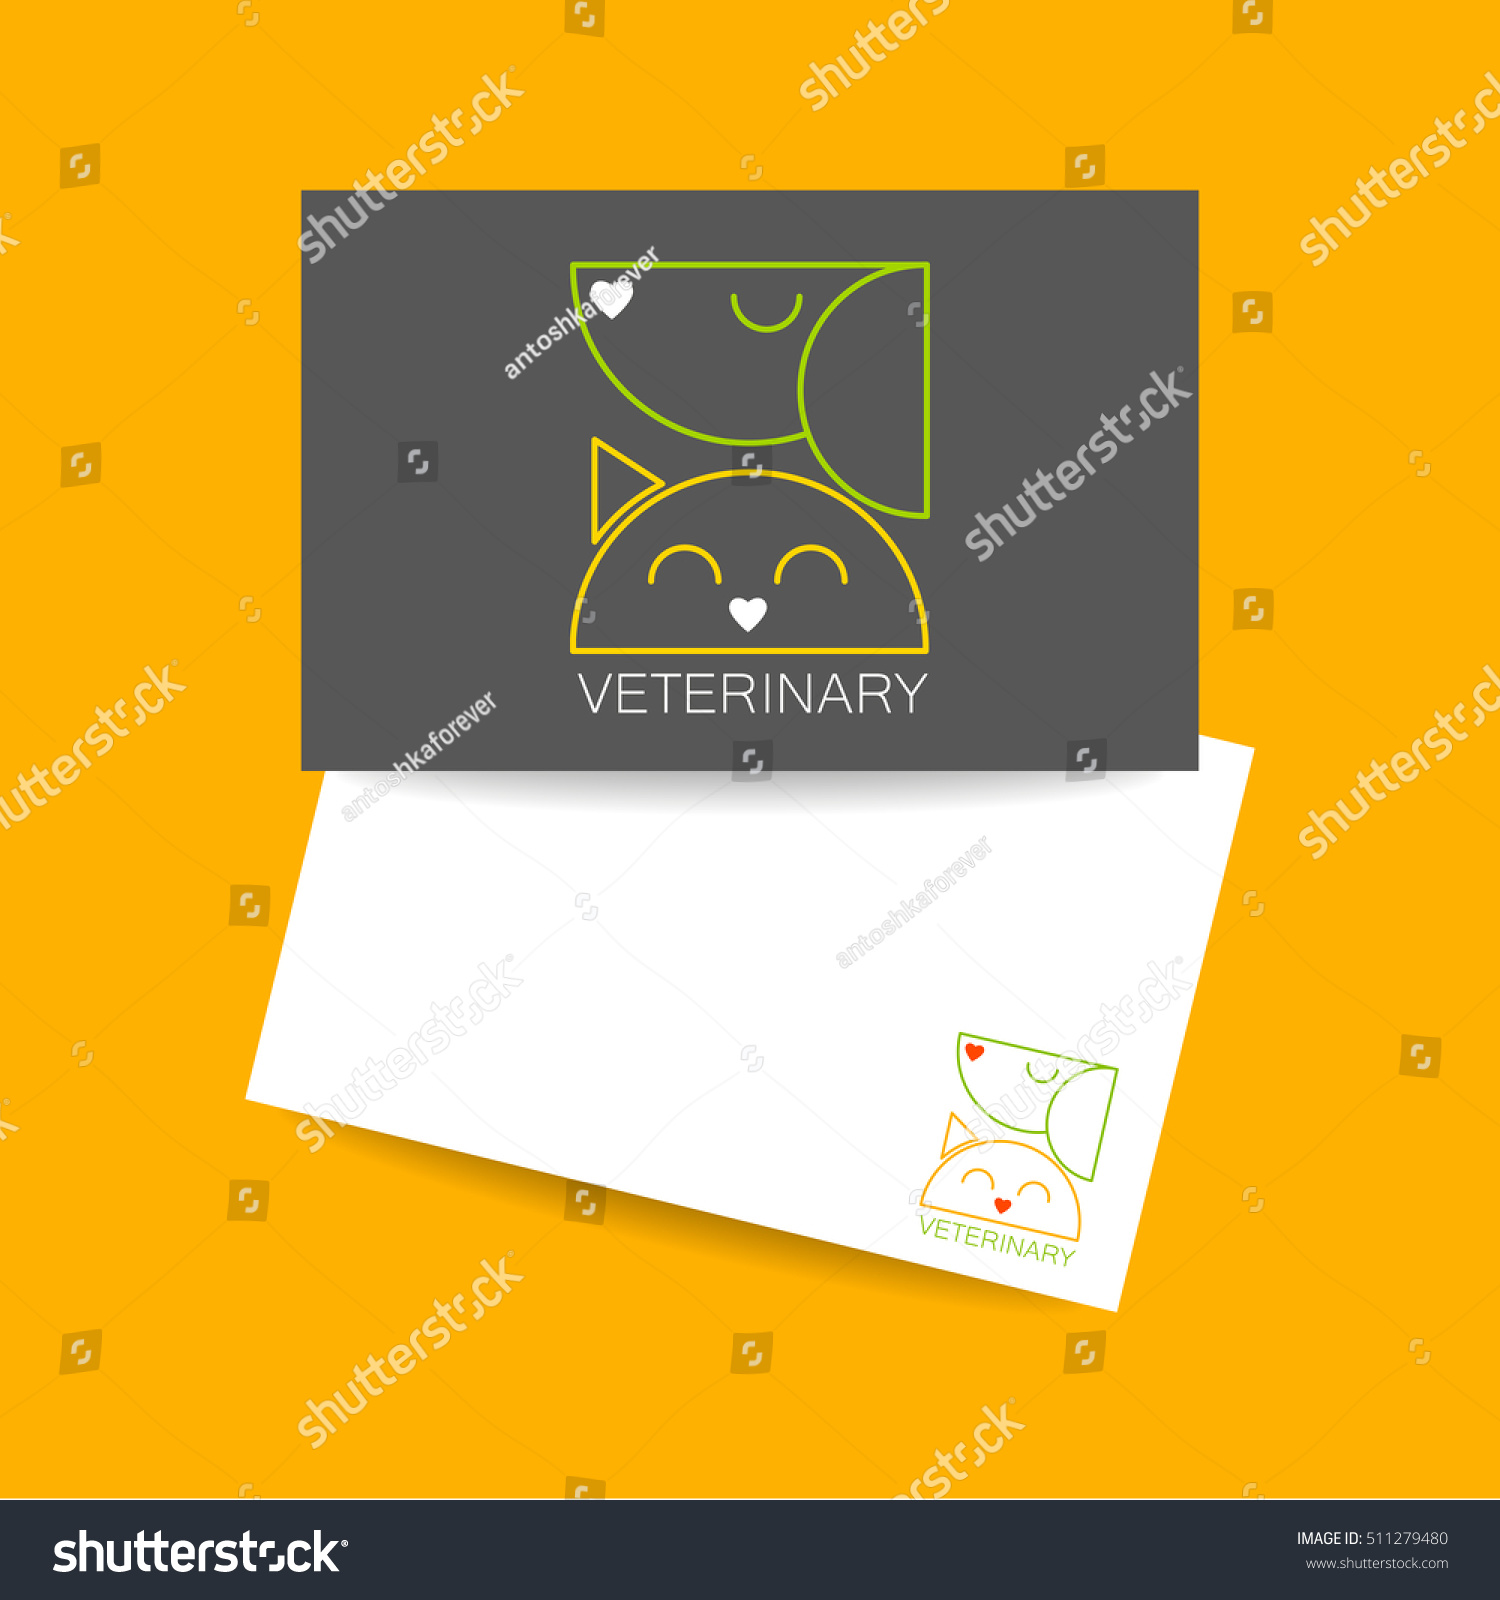 Veterinary Clinic Business Card Template Idea Stock Vector 511279480 ...